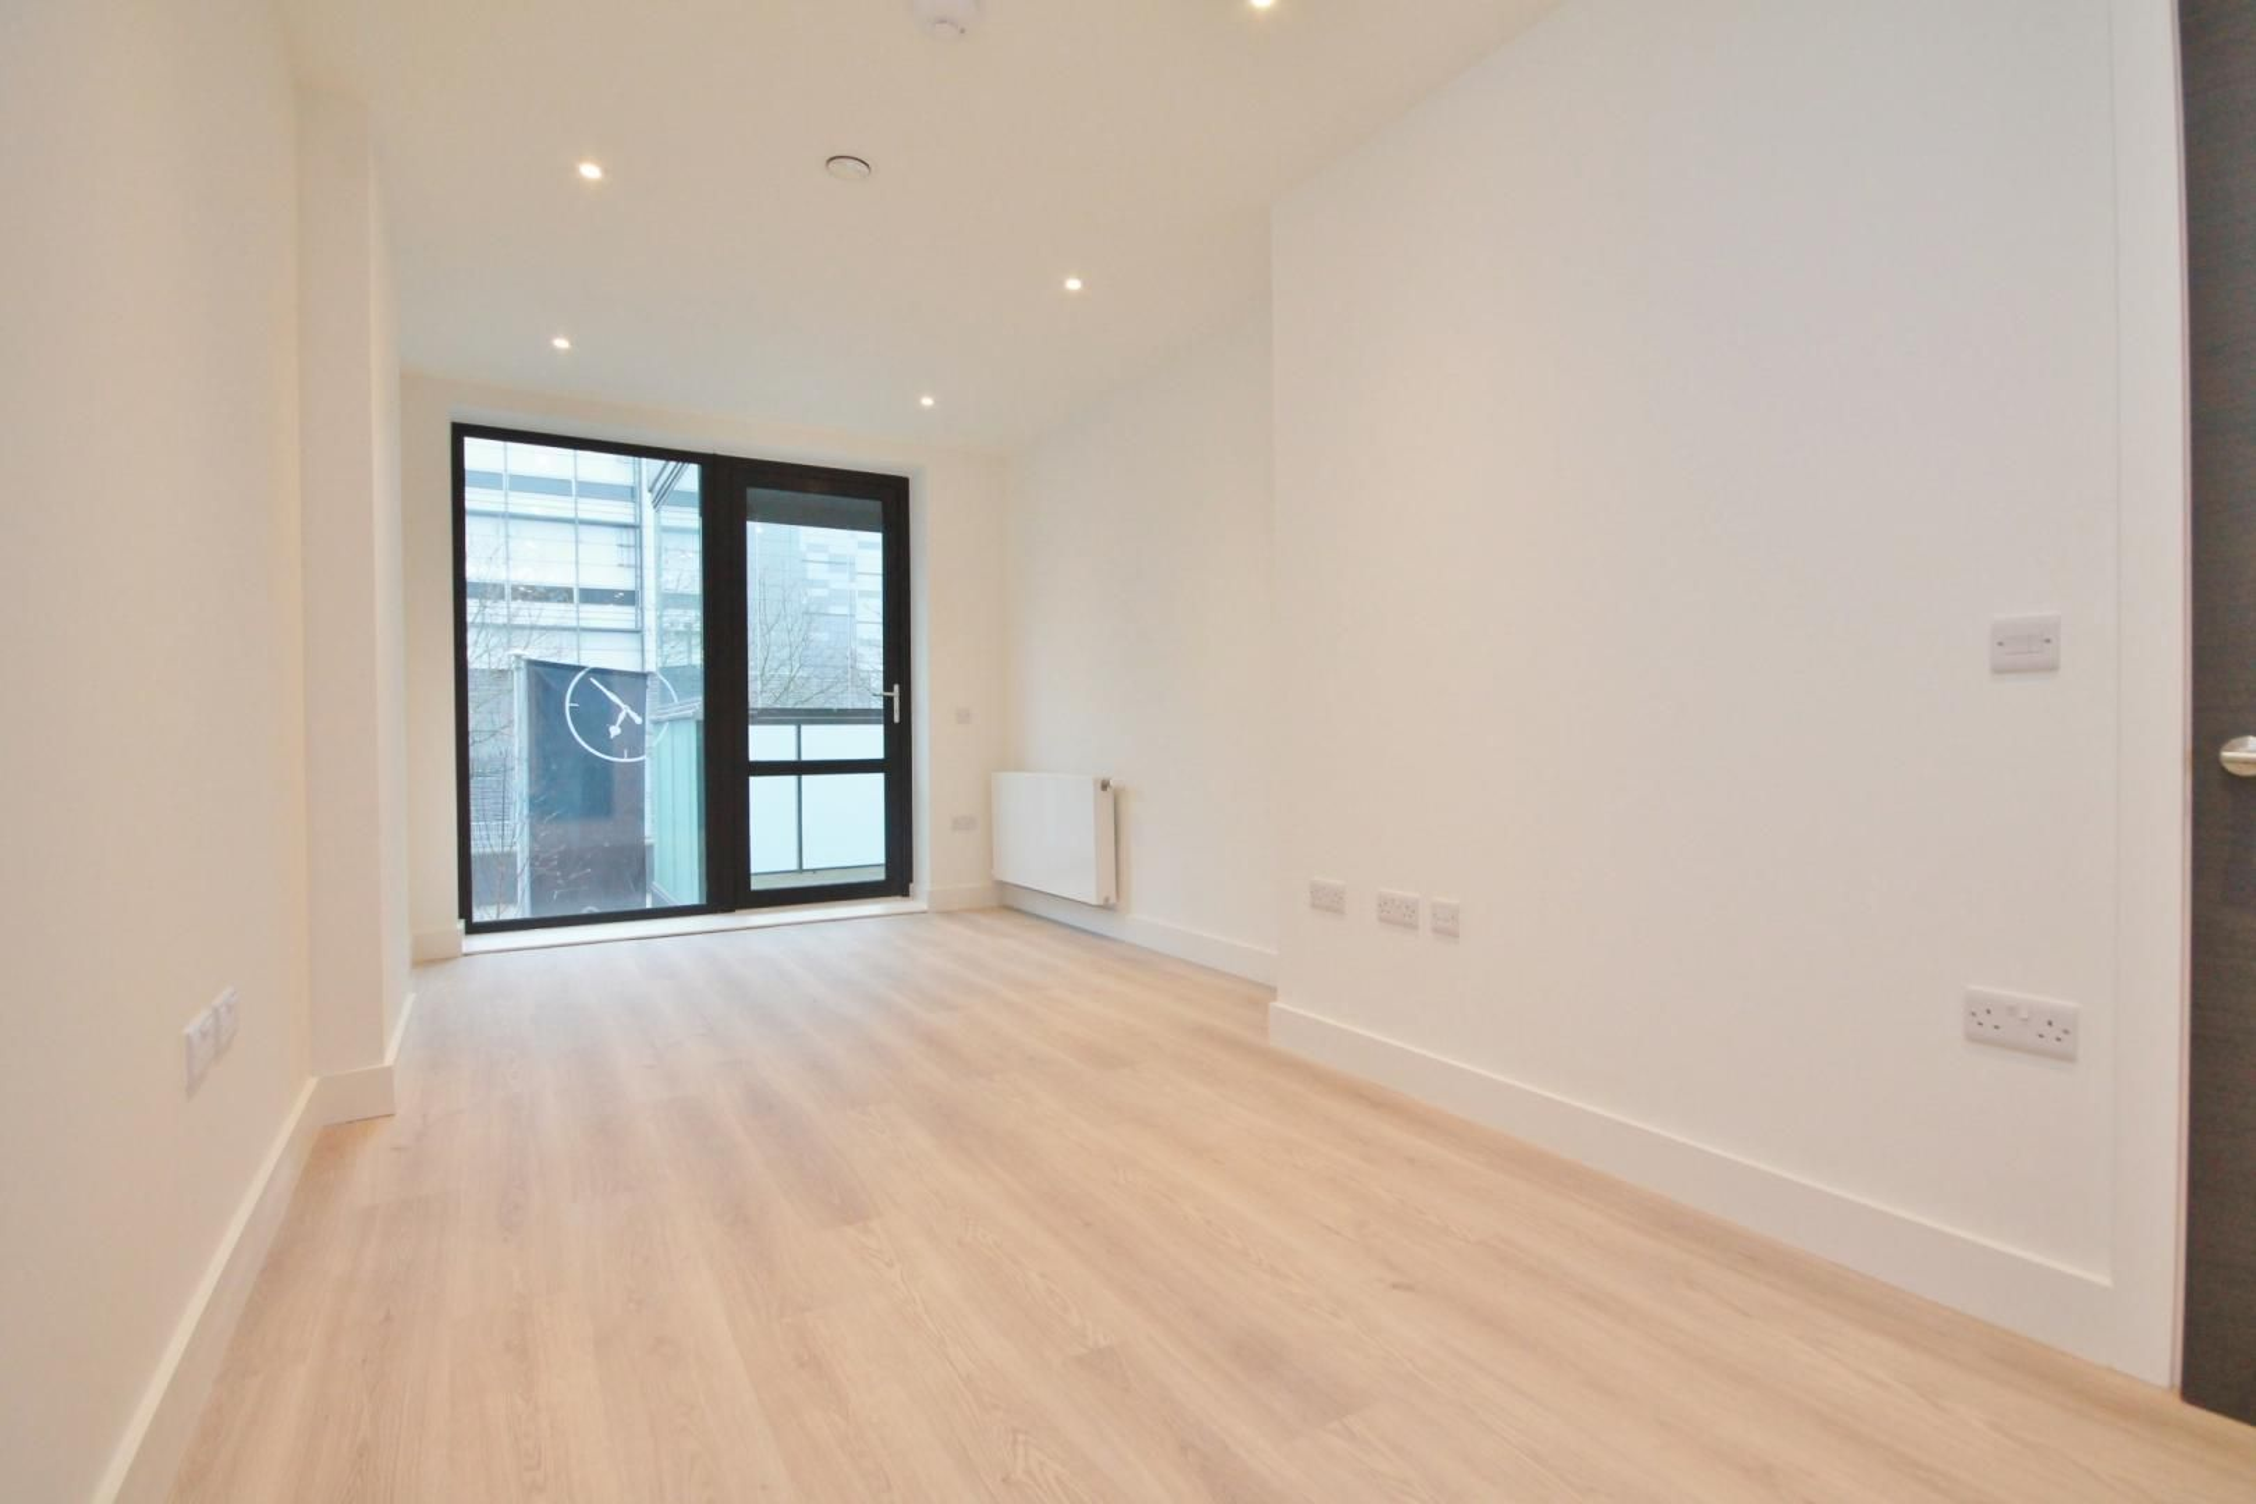 1 bed flat for sale in Aberfeldy Village  - Property Image 2